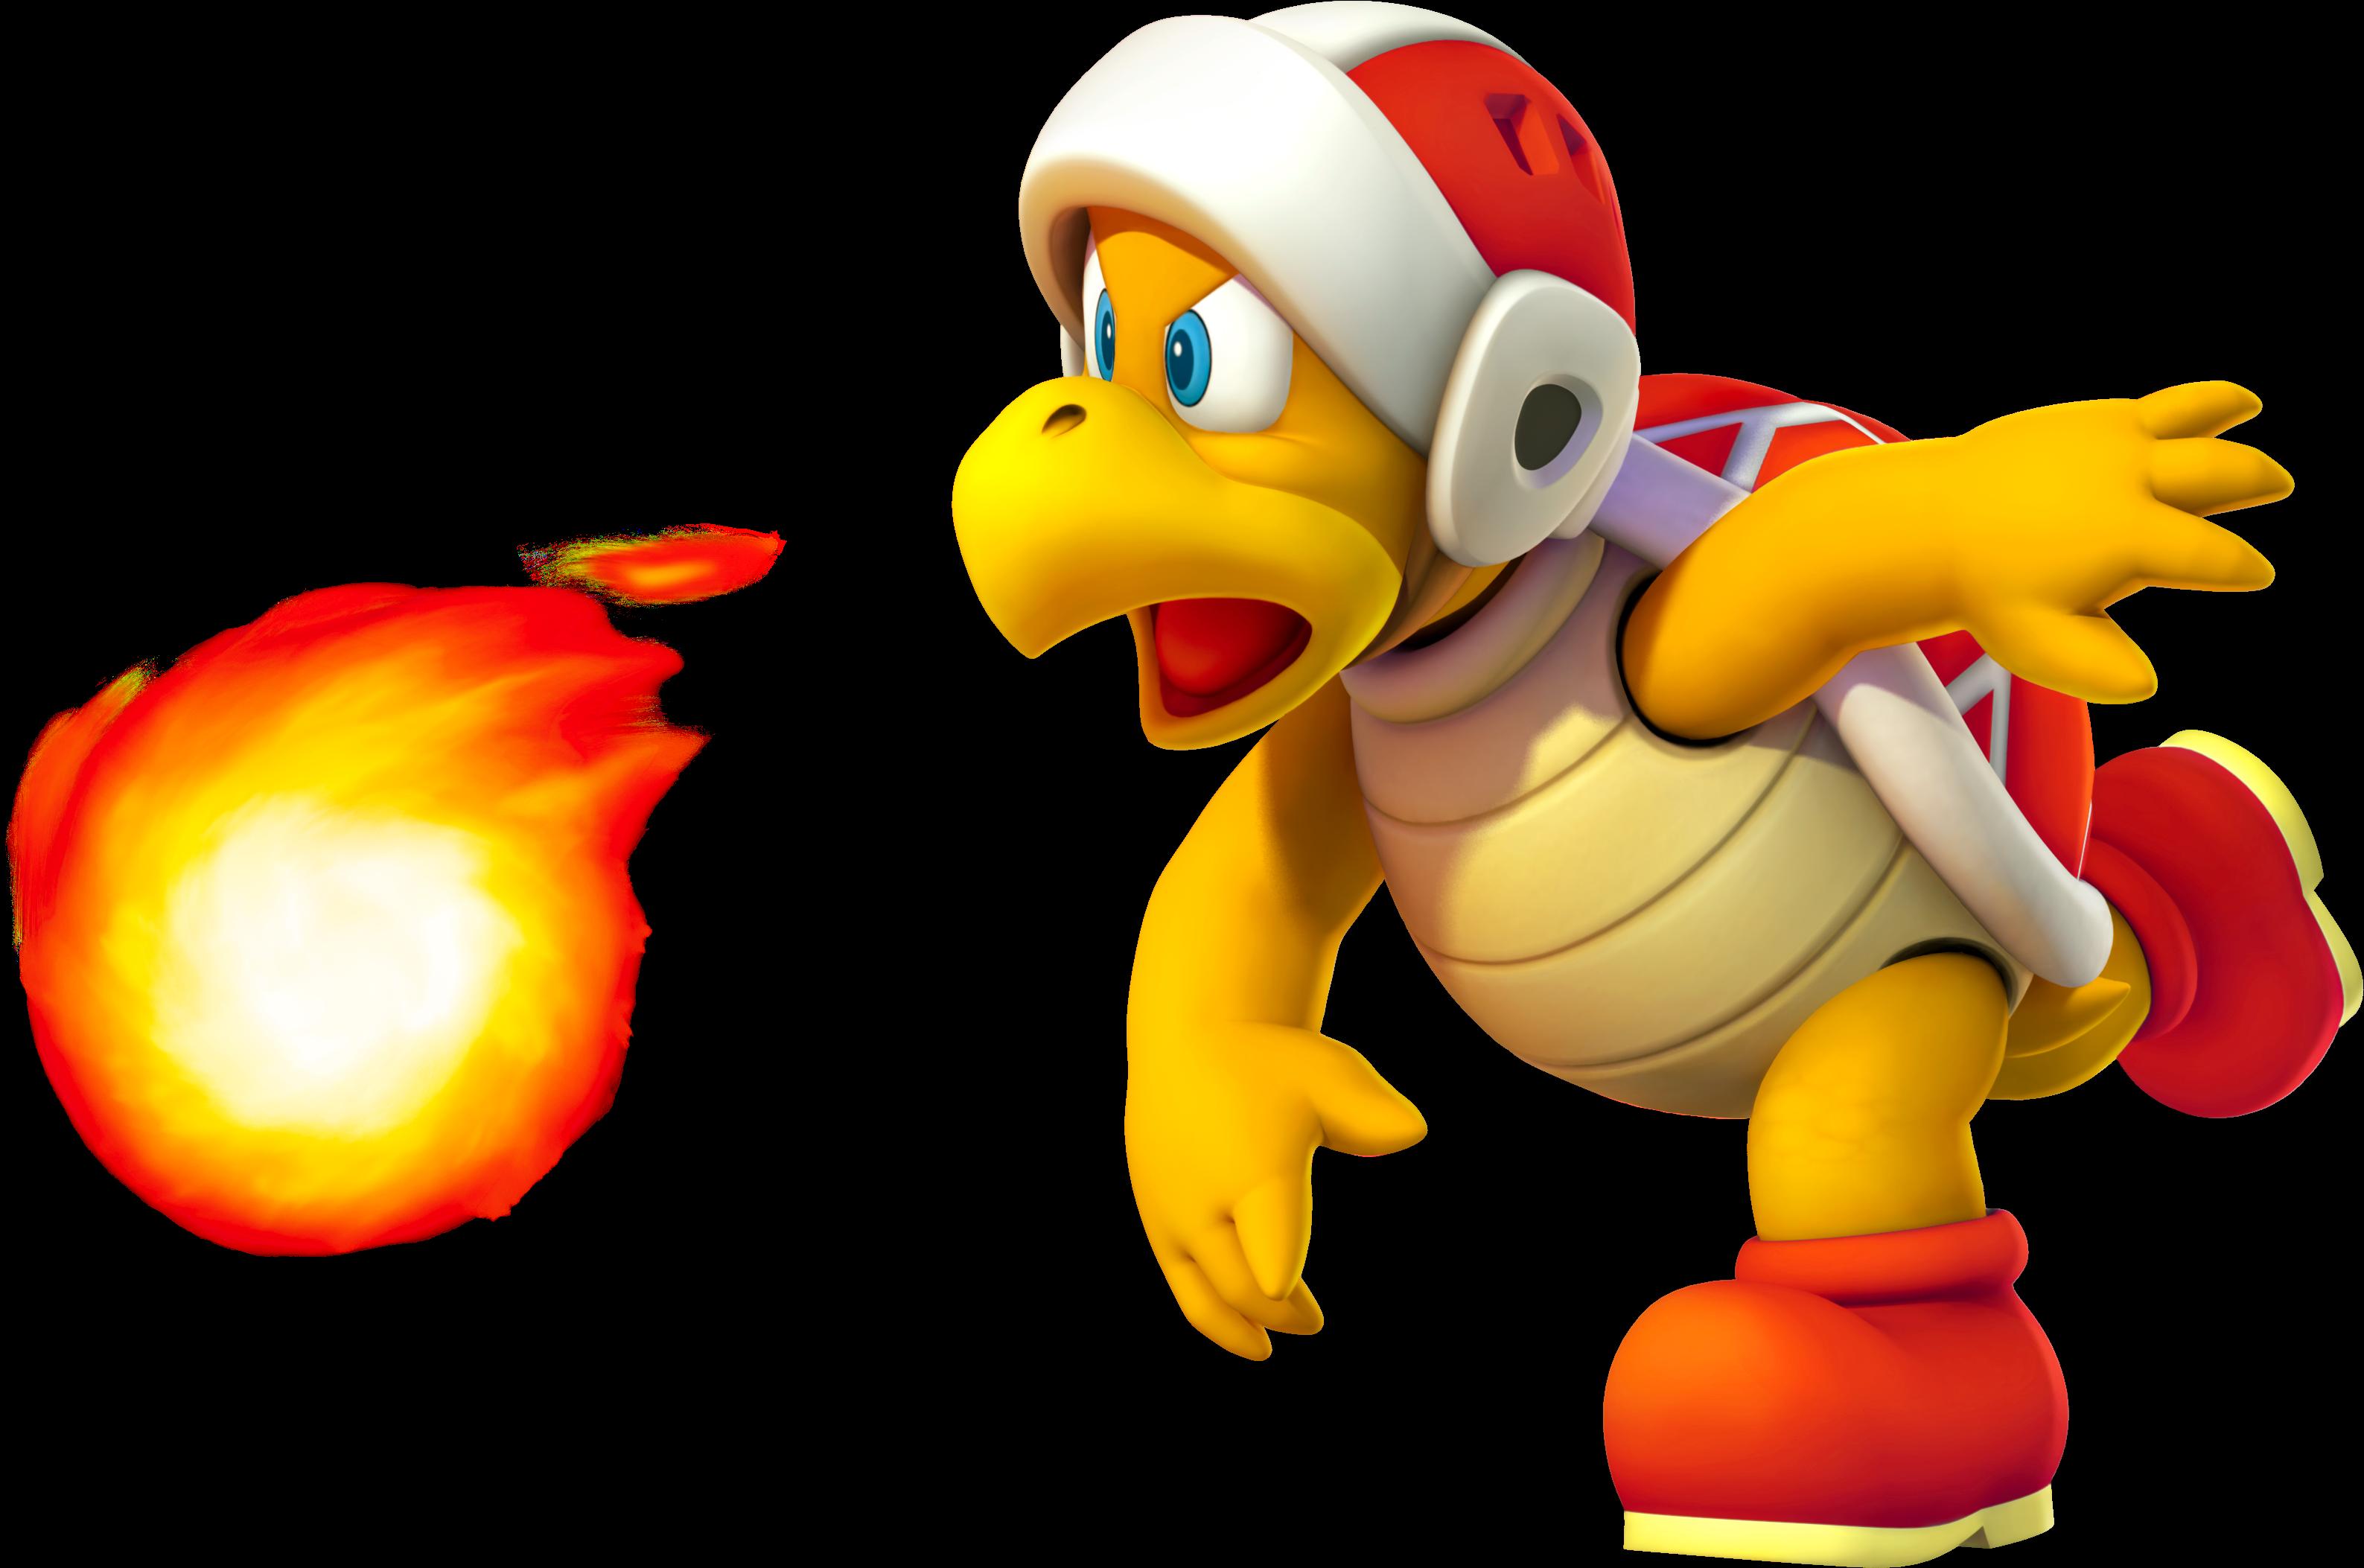 Explosion clipart fiery. Fire bro fantendo nintendo